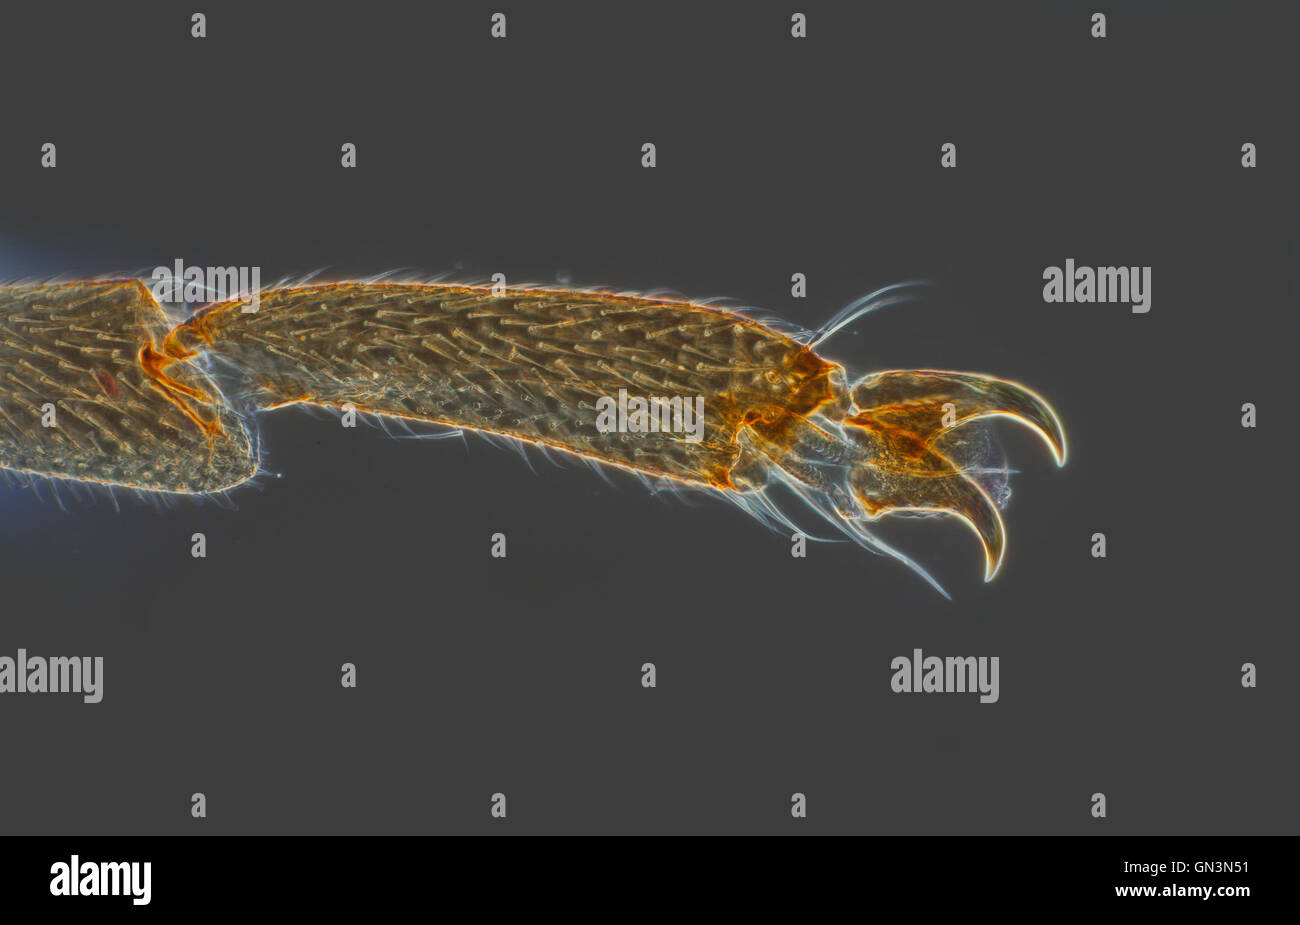 Stonefly leg, Plecoptera bracnypter male, darkfield photomicrograph - Stock Image